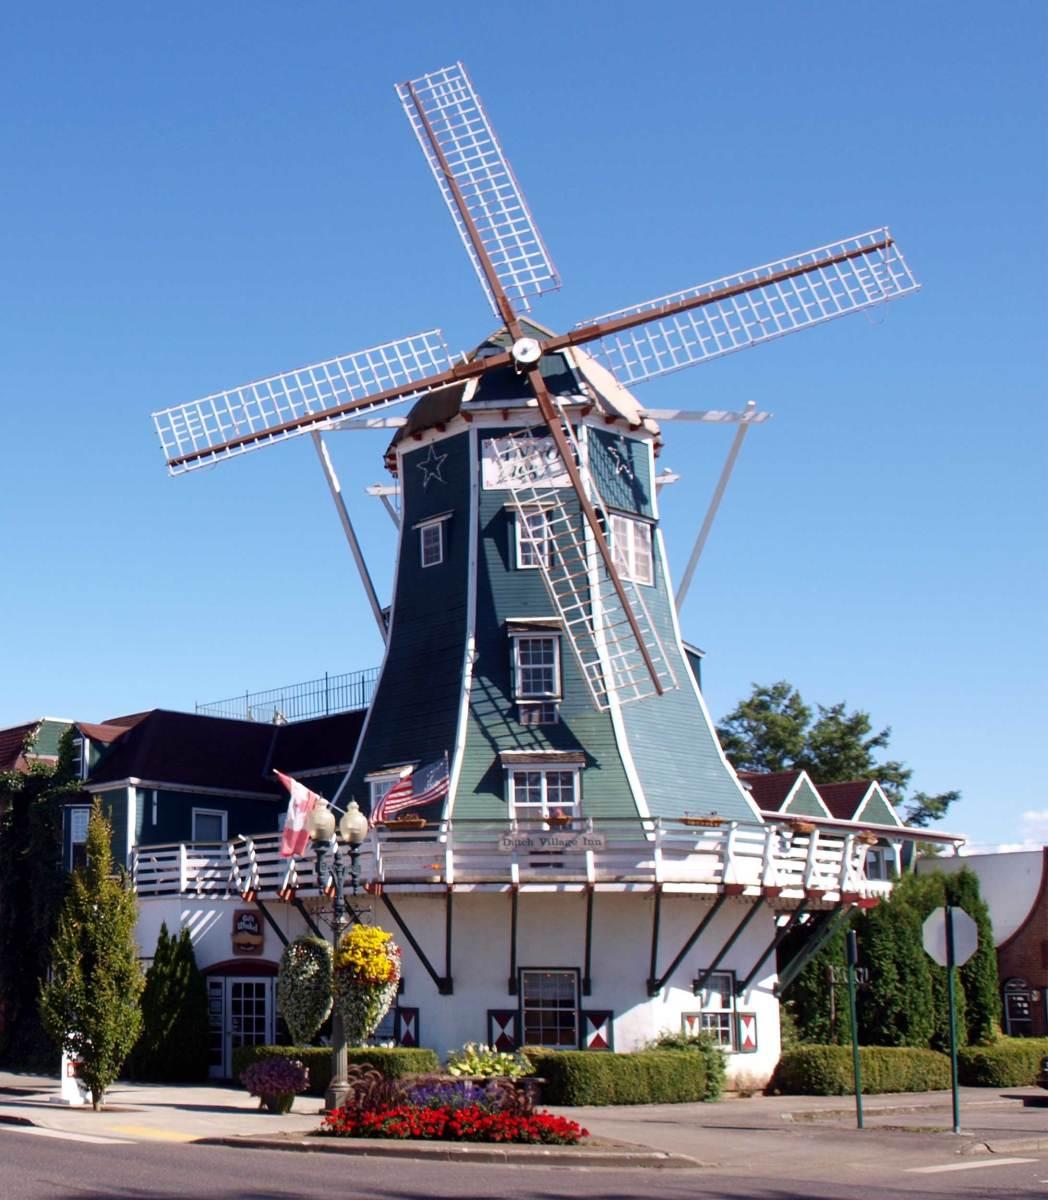 Lynden, Washington: A Quaint Dutch Town in the Pacific Northwest